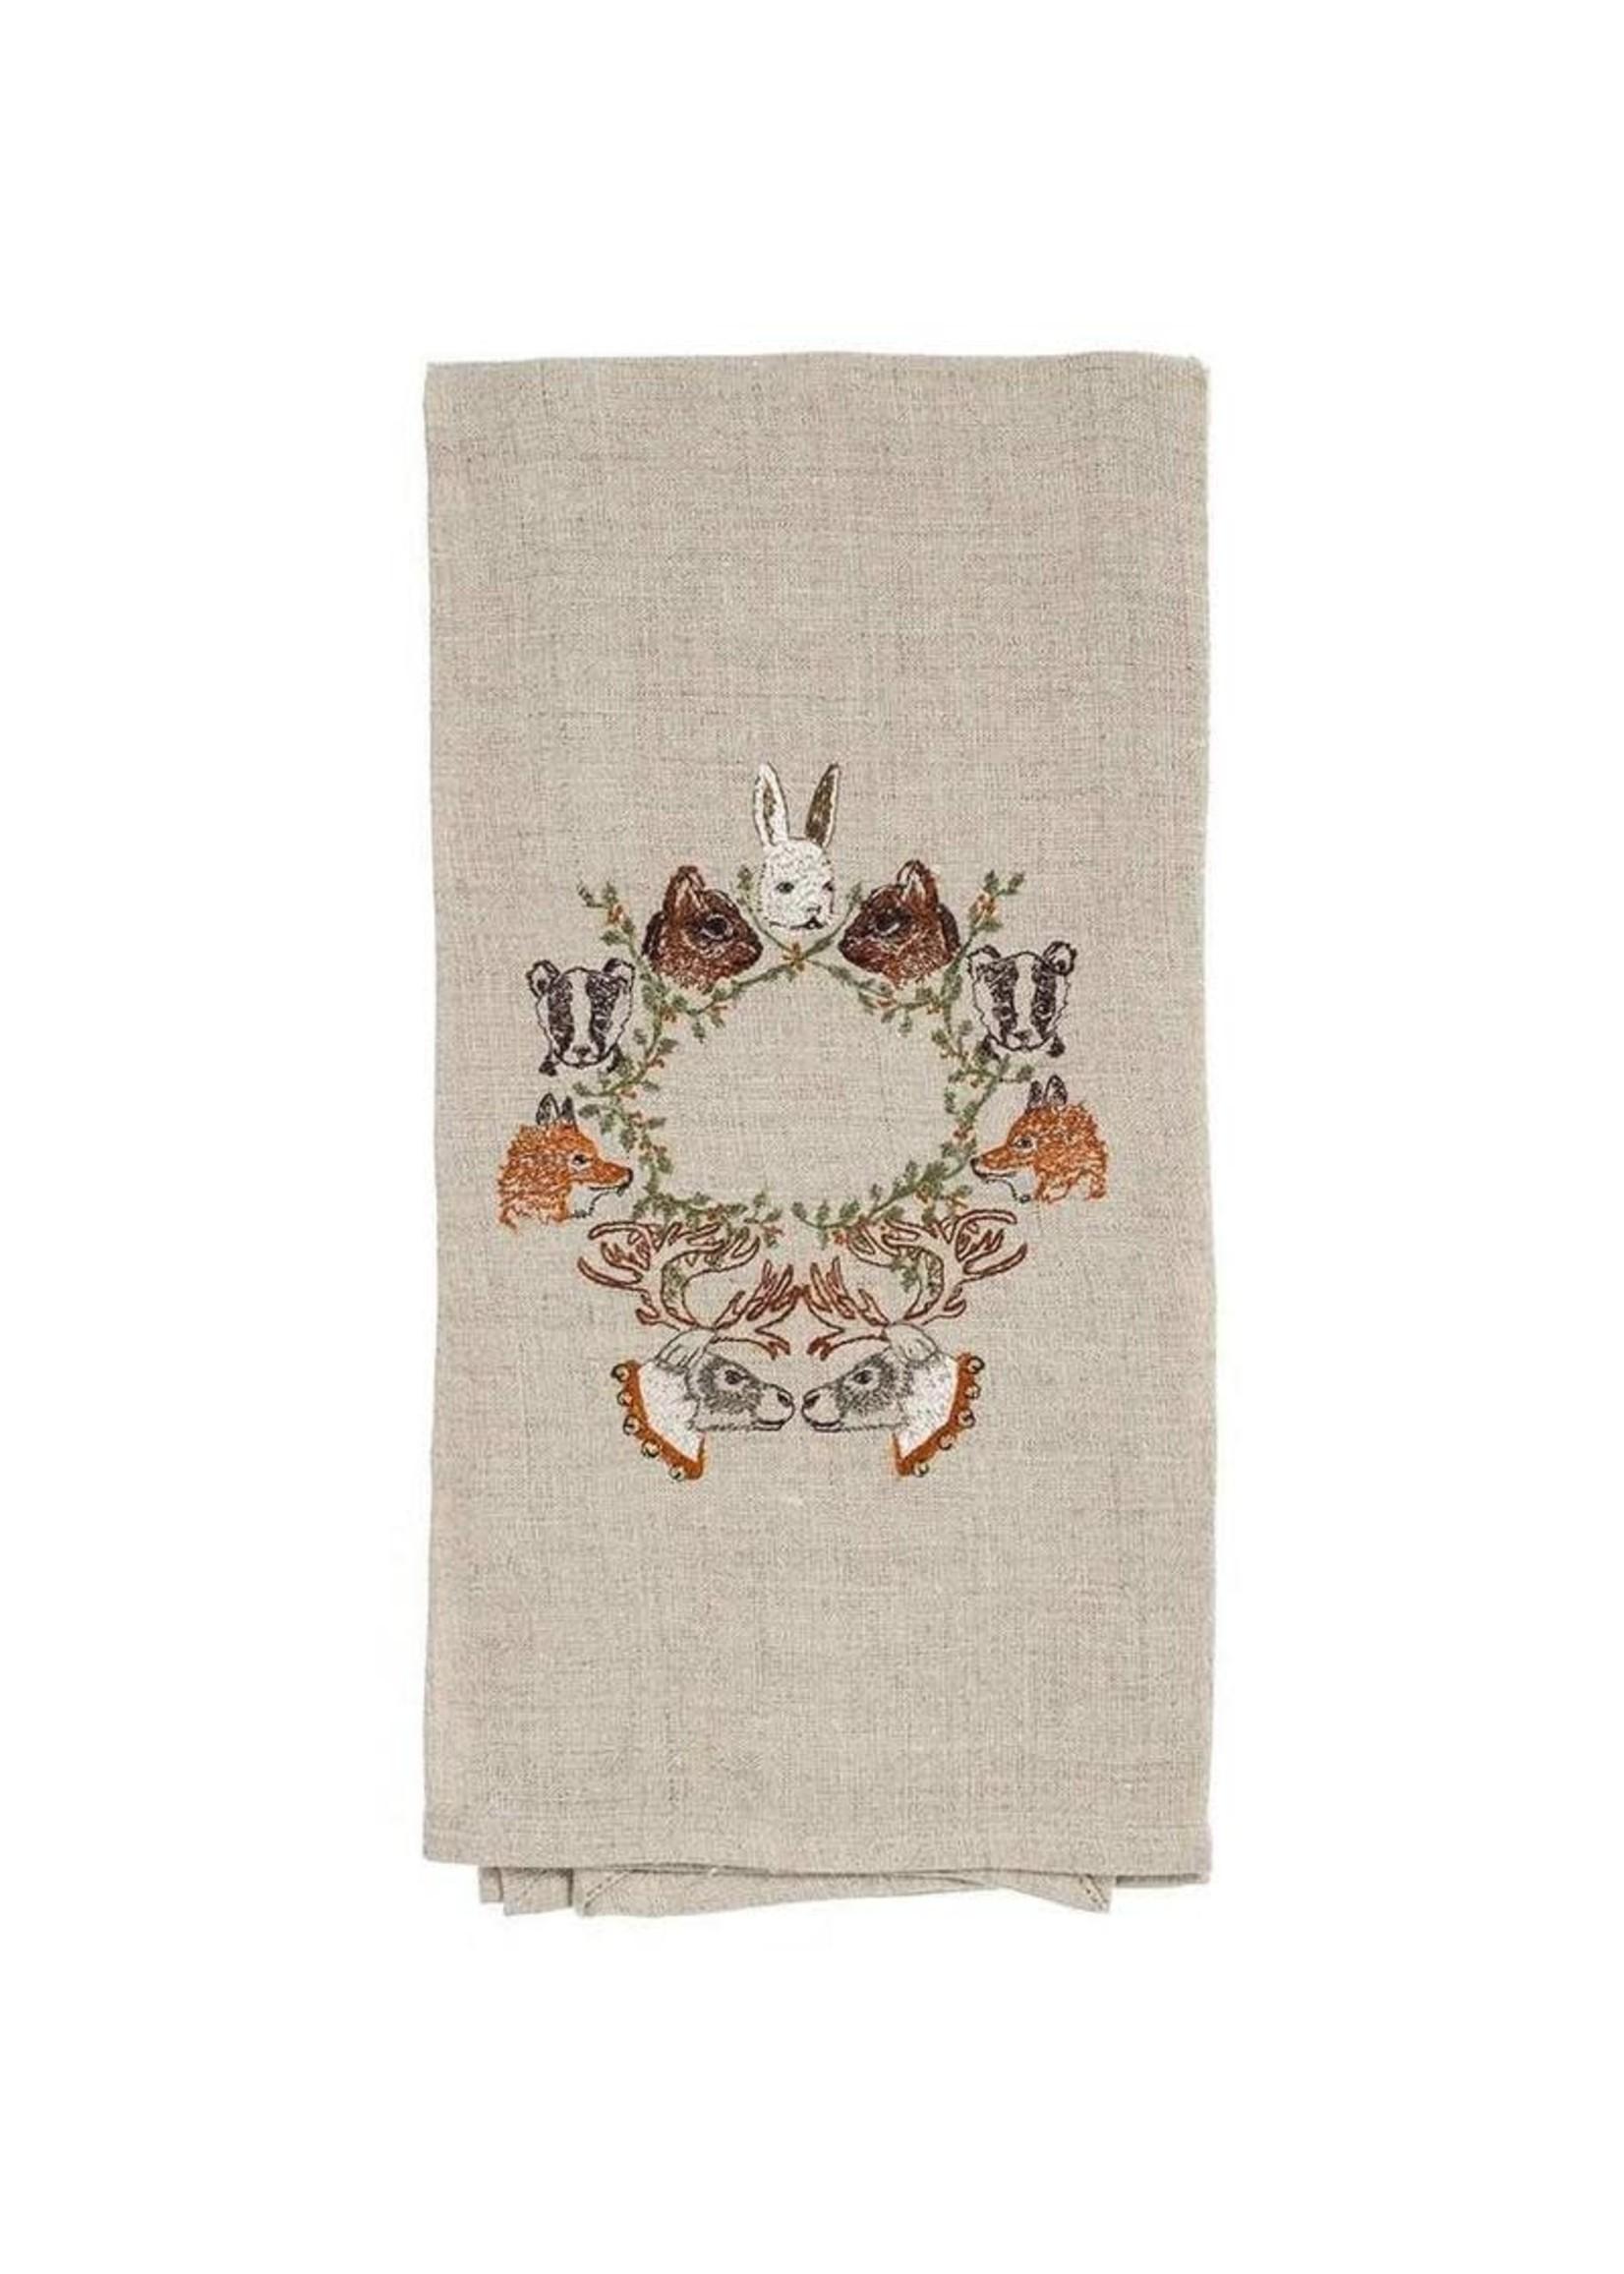 Coral and Tusk Tea Towel - Peek a Wreath